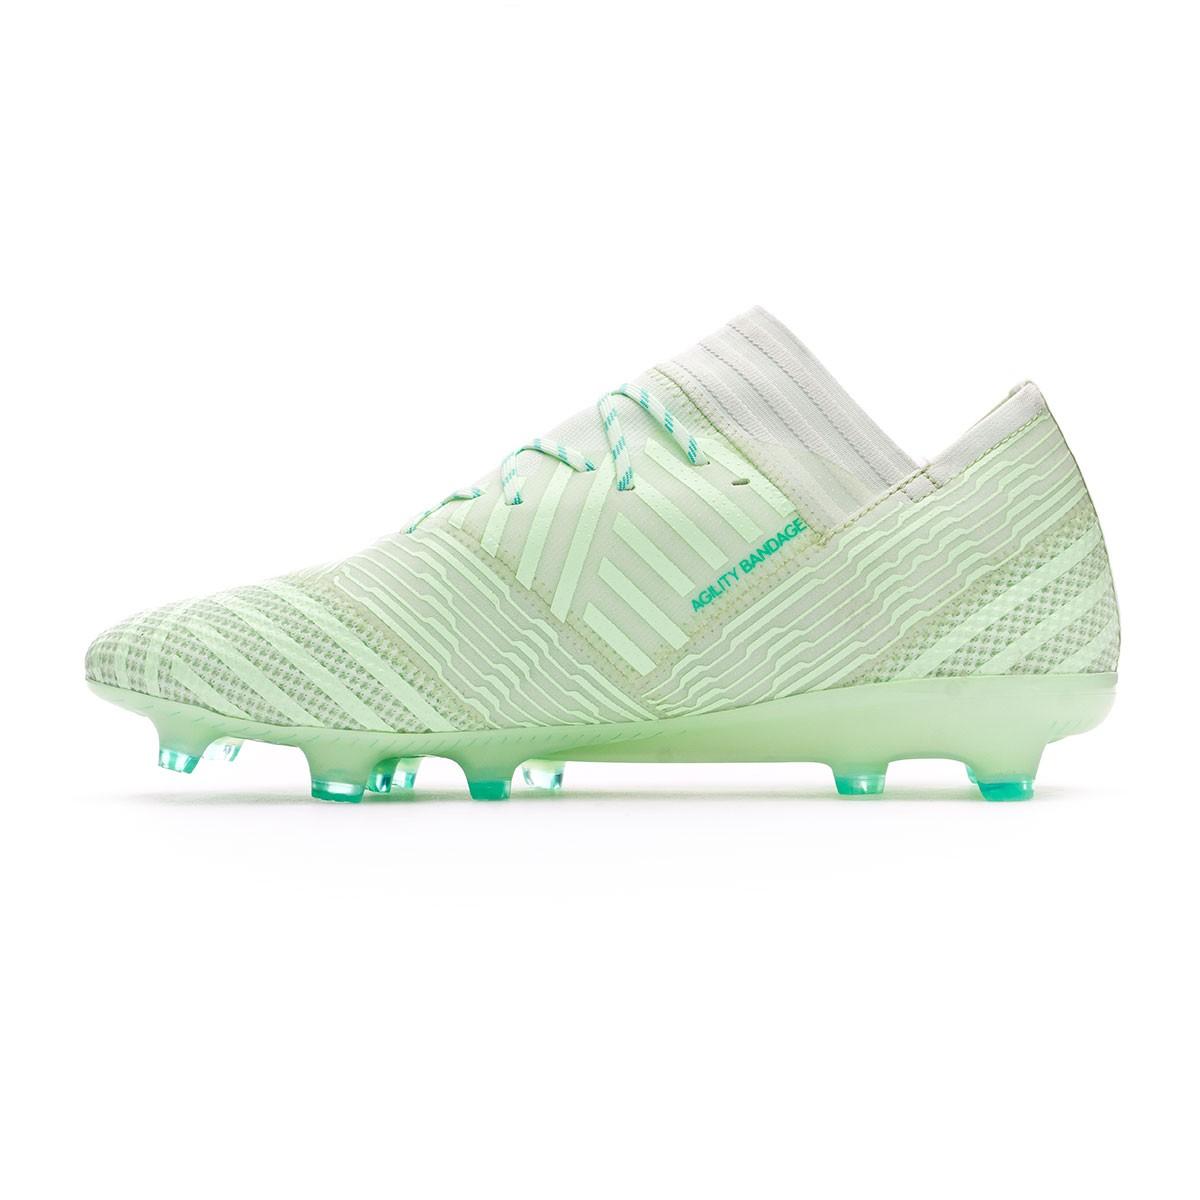 2612c3454 Football Boots adidas Nemeziz 17.1 FG Aero green-Hi-res green - Football  store Fútbol Emotion